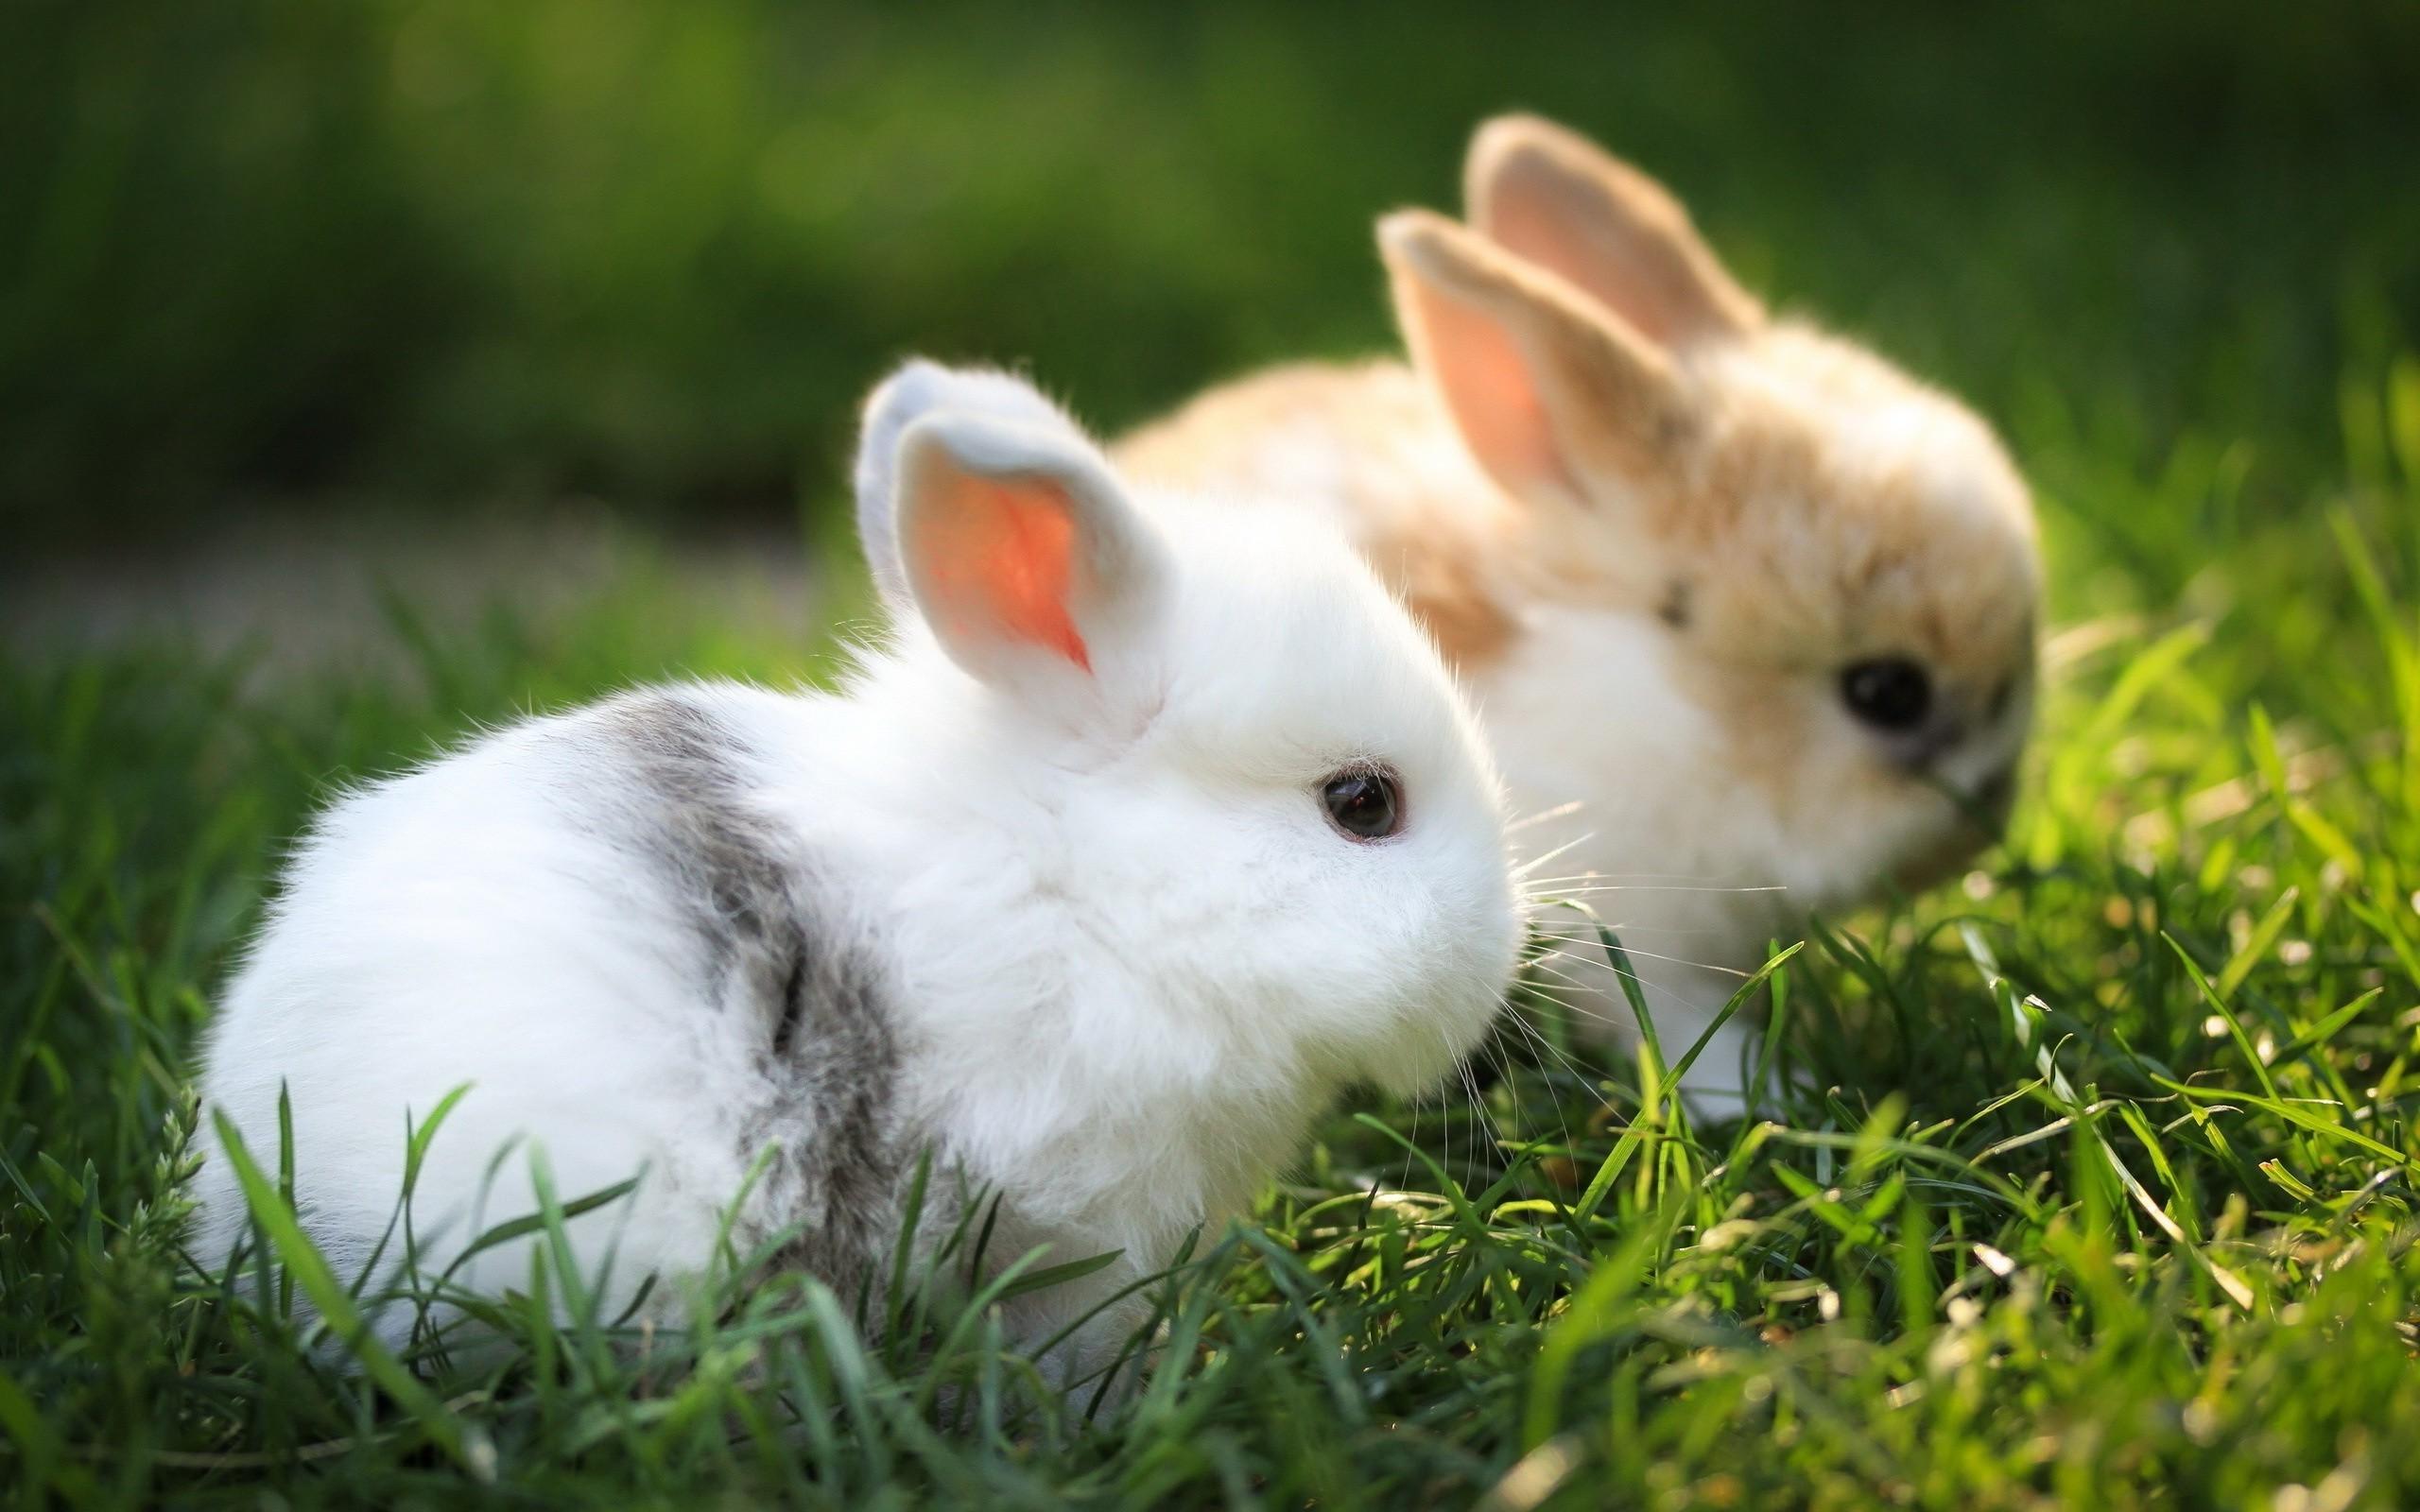 Cute White Rabbit Wallpapers For Desktop